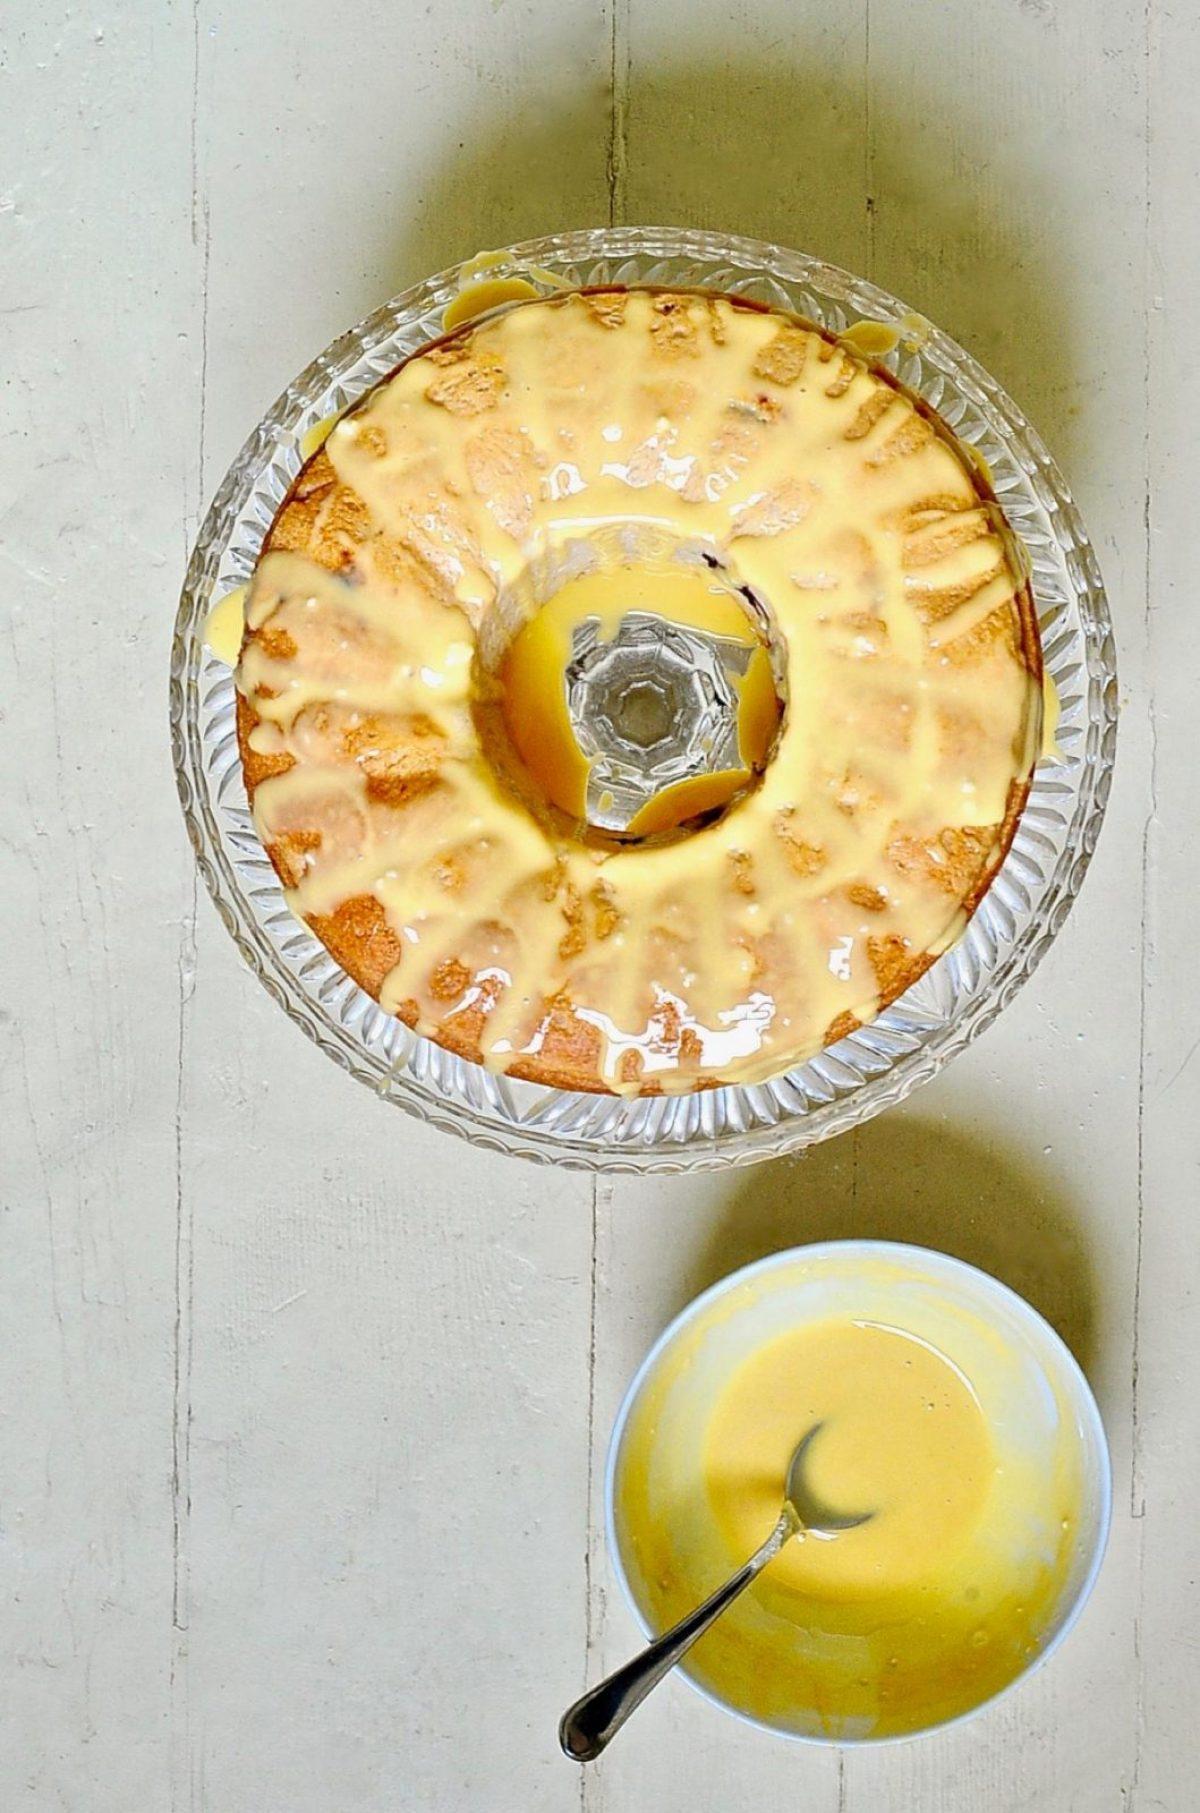 Classic vegan Babka with orange glaze on a glass cake stand.